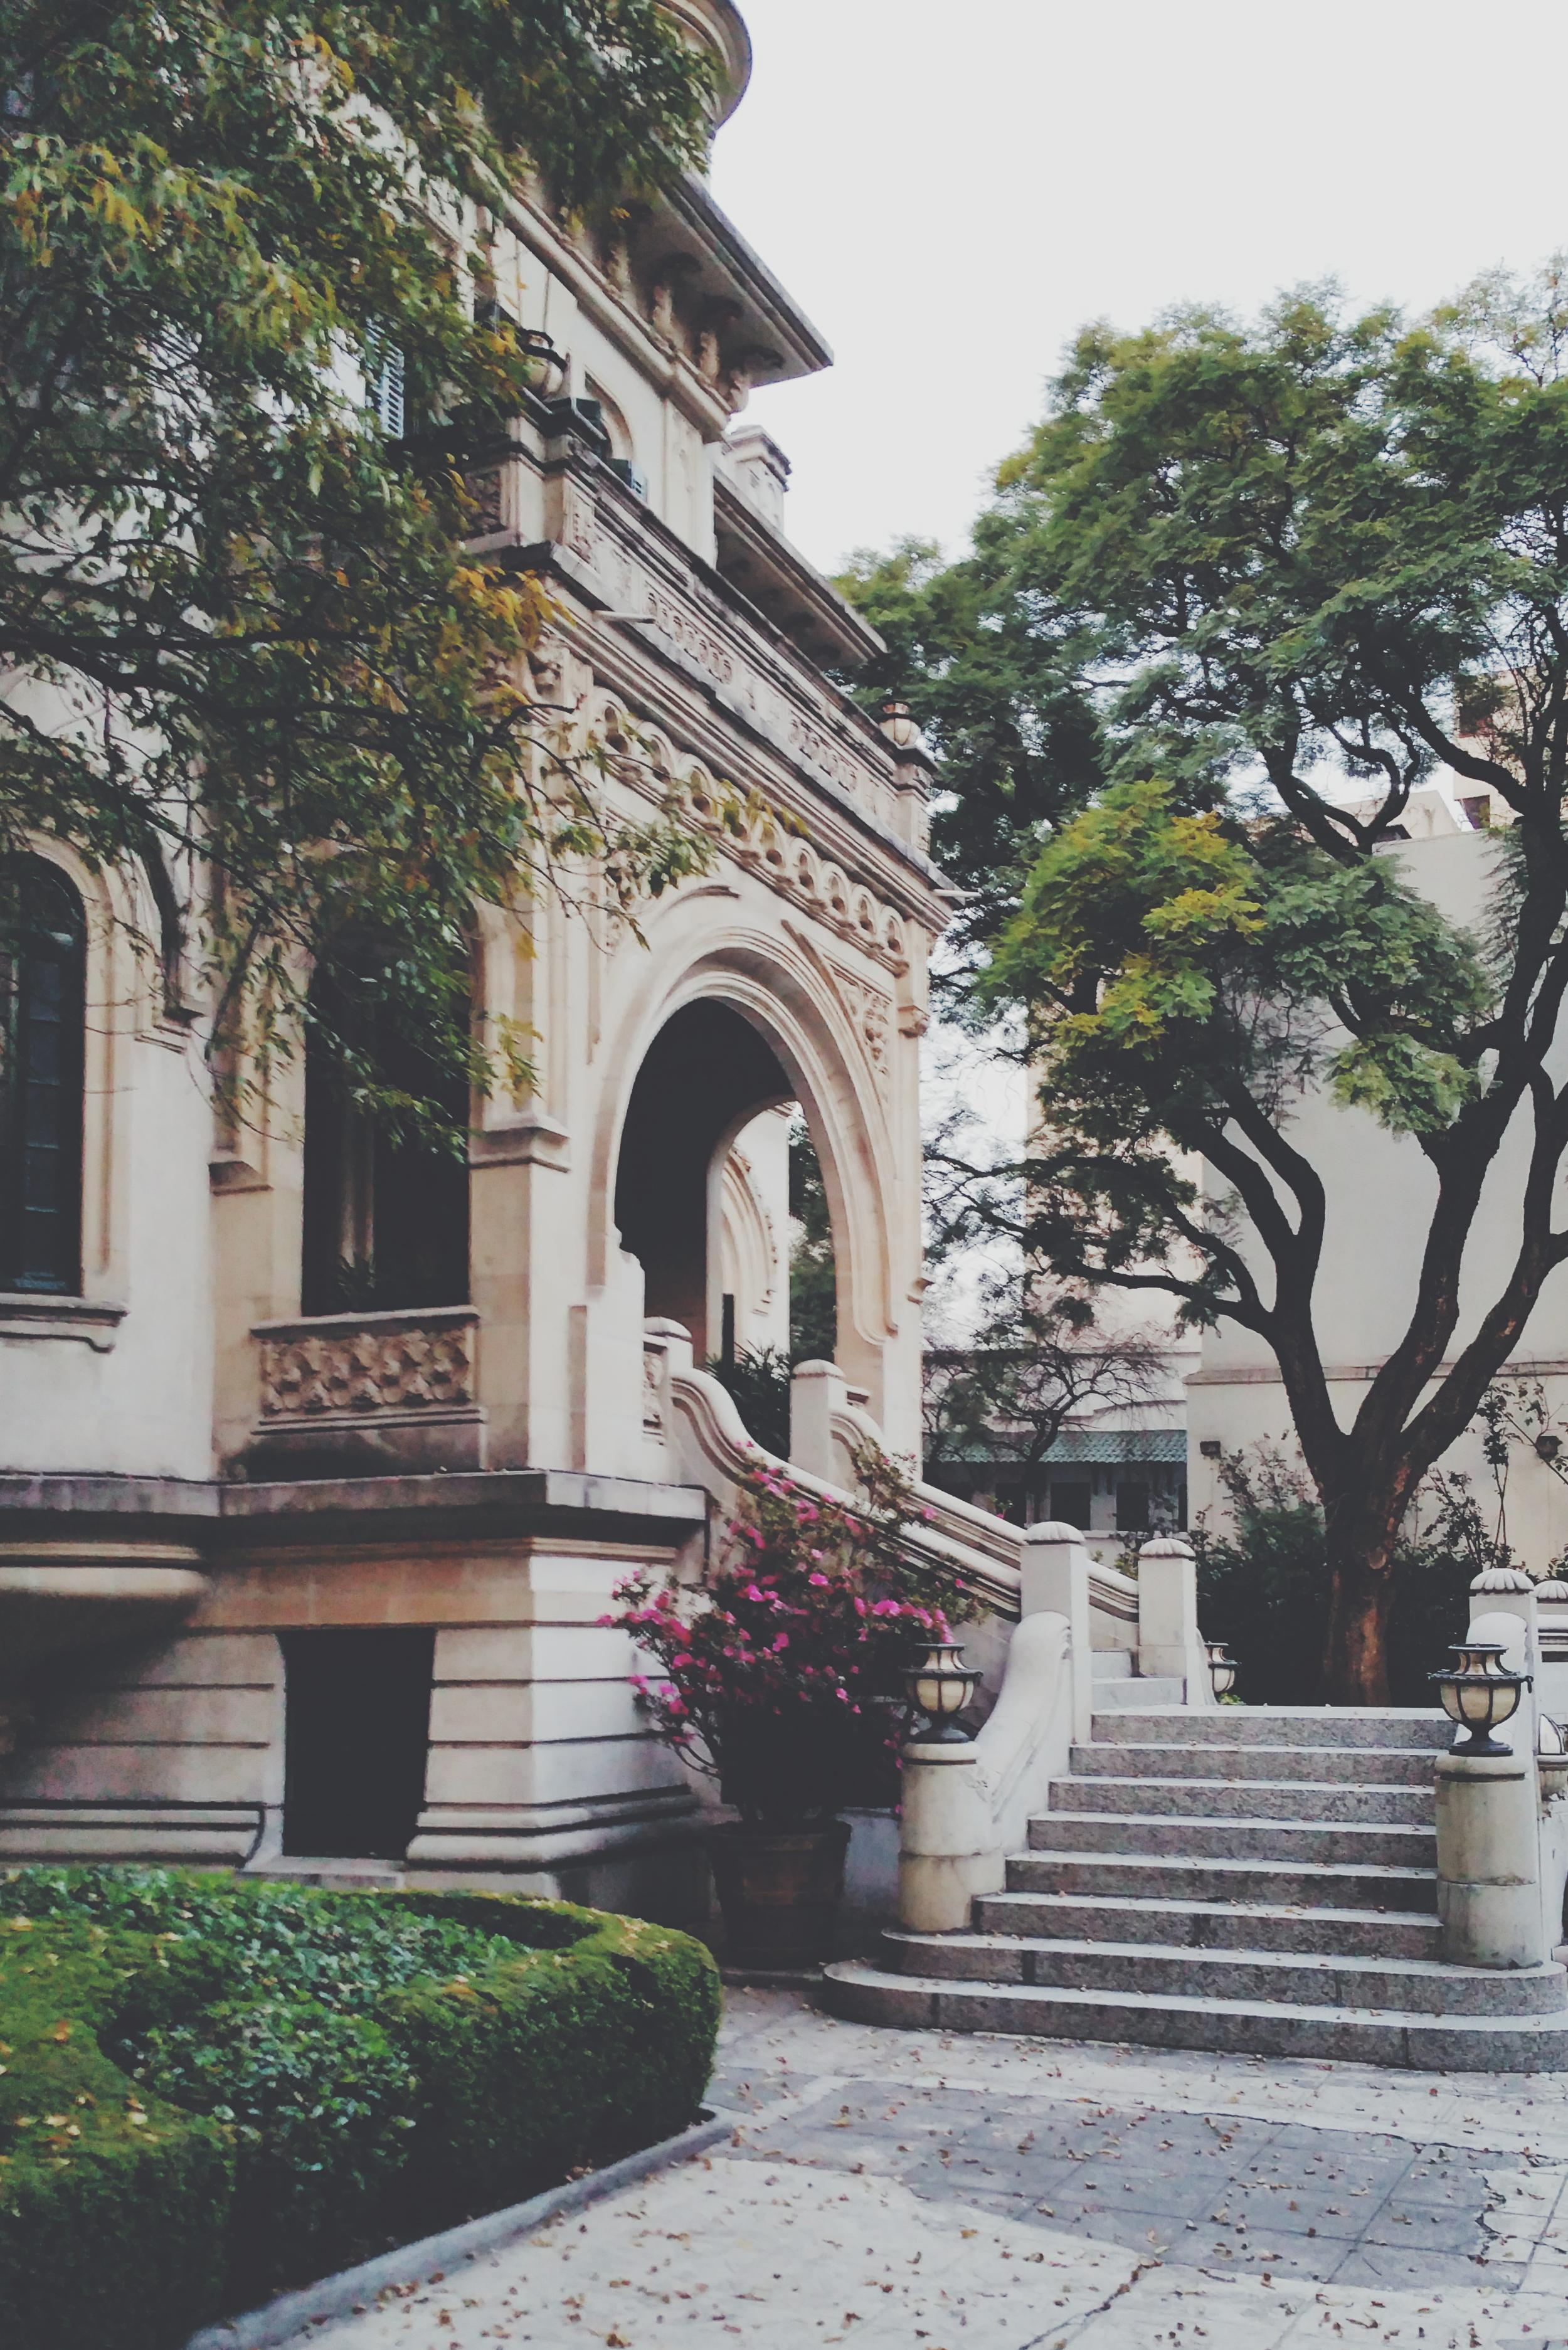 Homes of Condesa